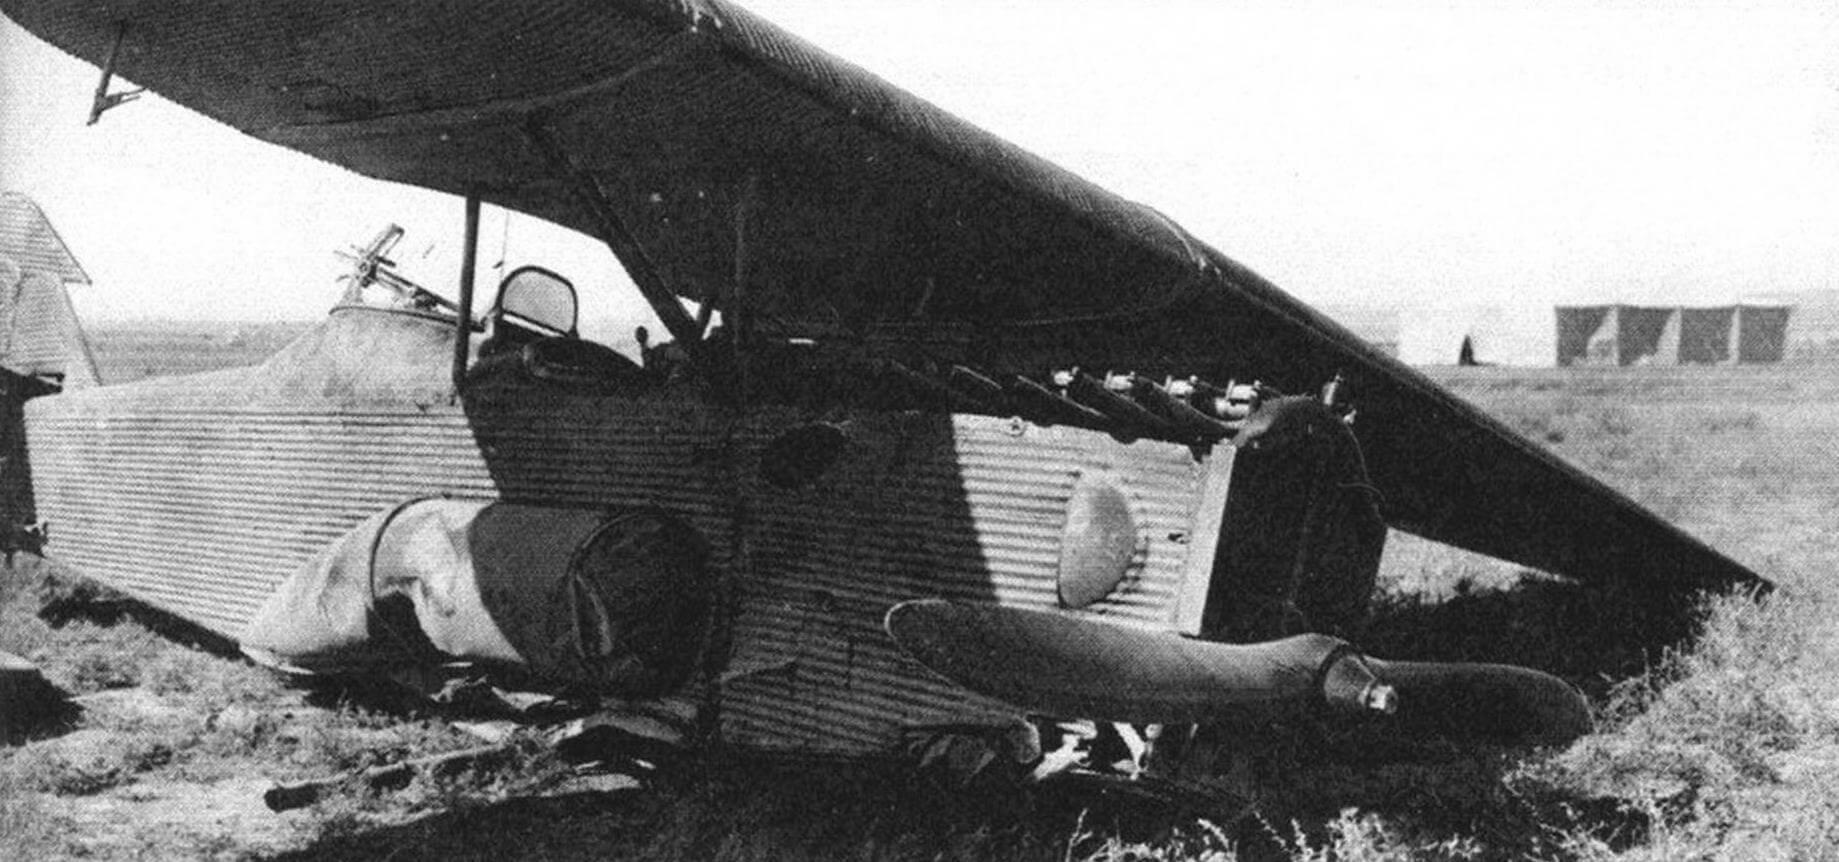 Авария Ю-21 на посадке из-за отказа мотора, 35-й авиаотряд, Троицк, летчик М.Н. Юсуф